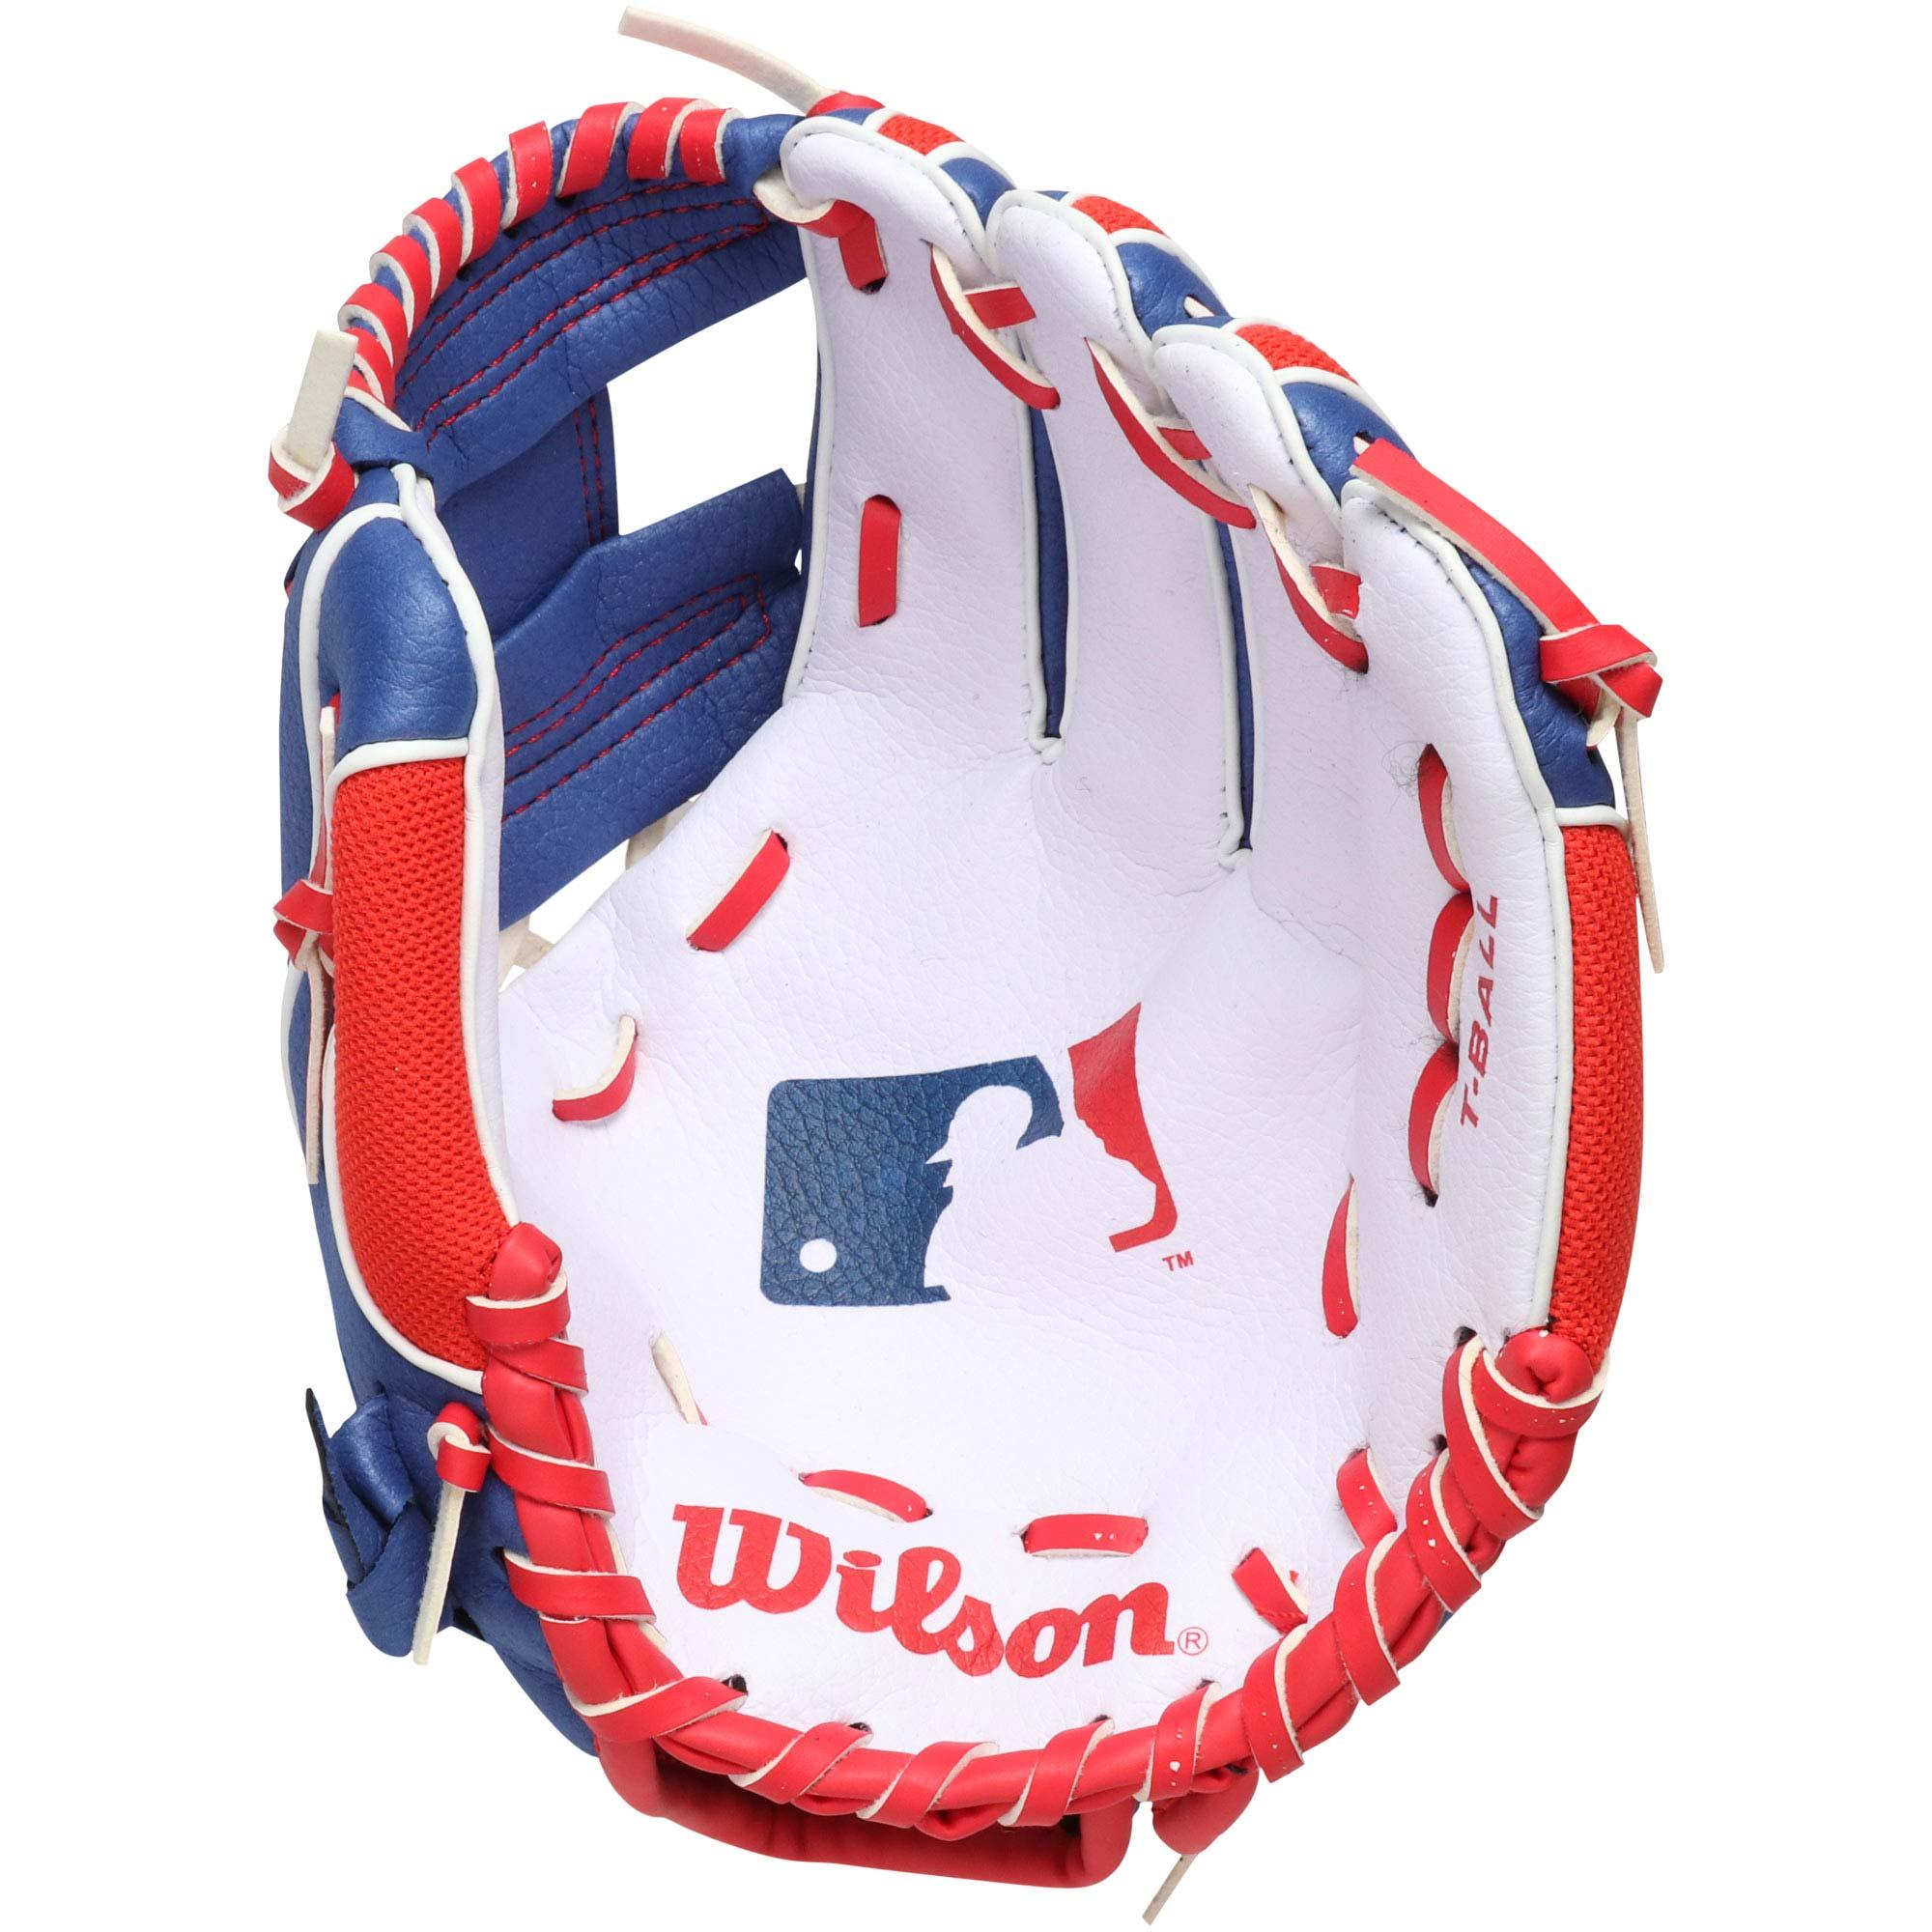 Mlb Merchandise Wilson Youth Baseball Tee Ball Glove No Size